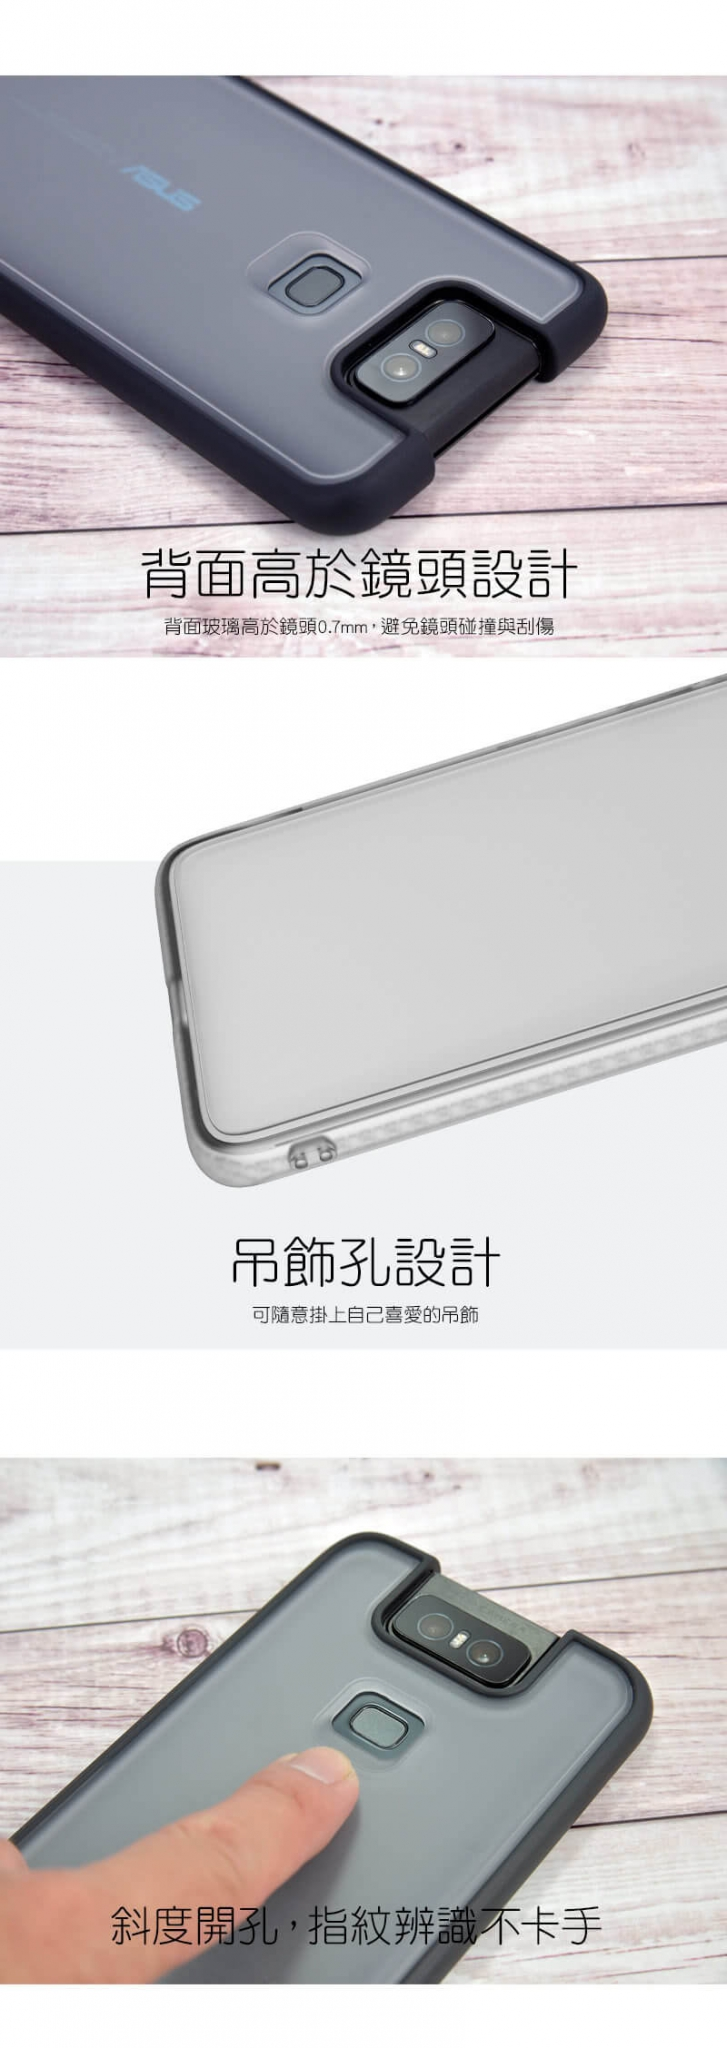 HODA 柔石軍規防摔殼 Zenfone 6 (ZS630KL)